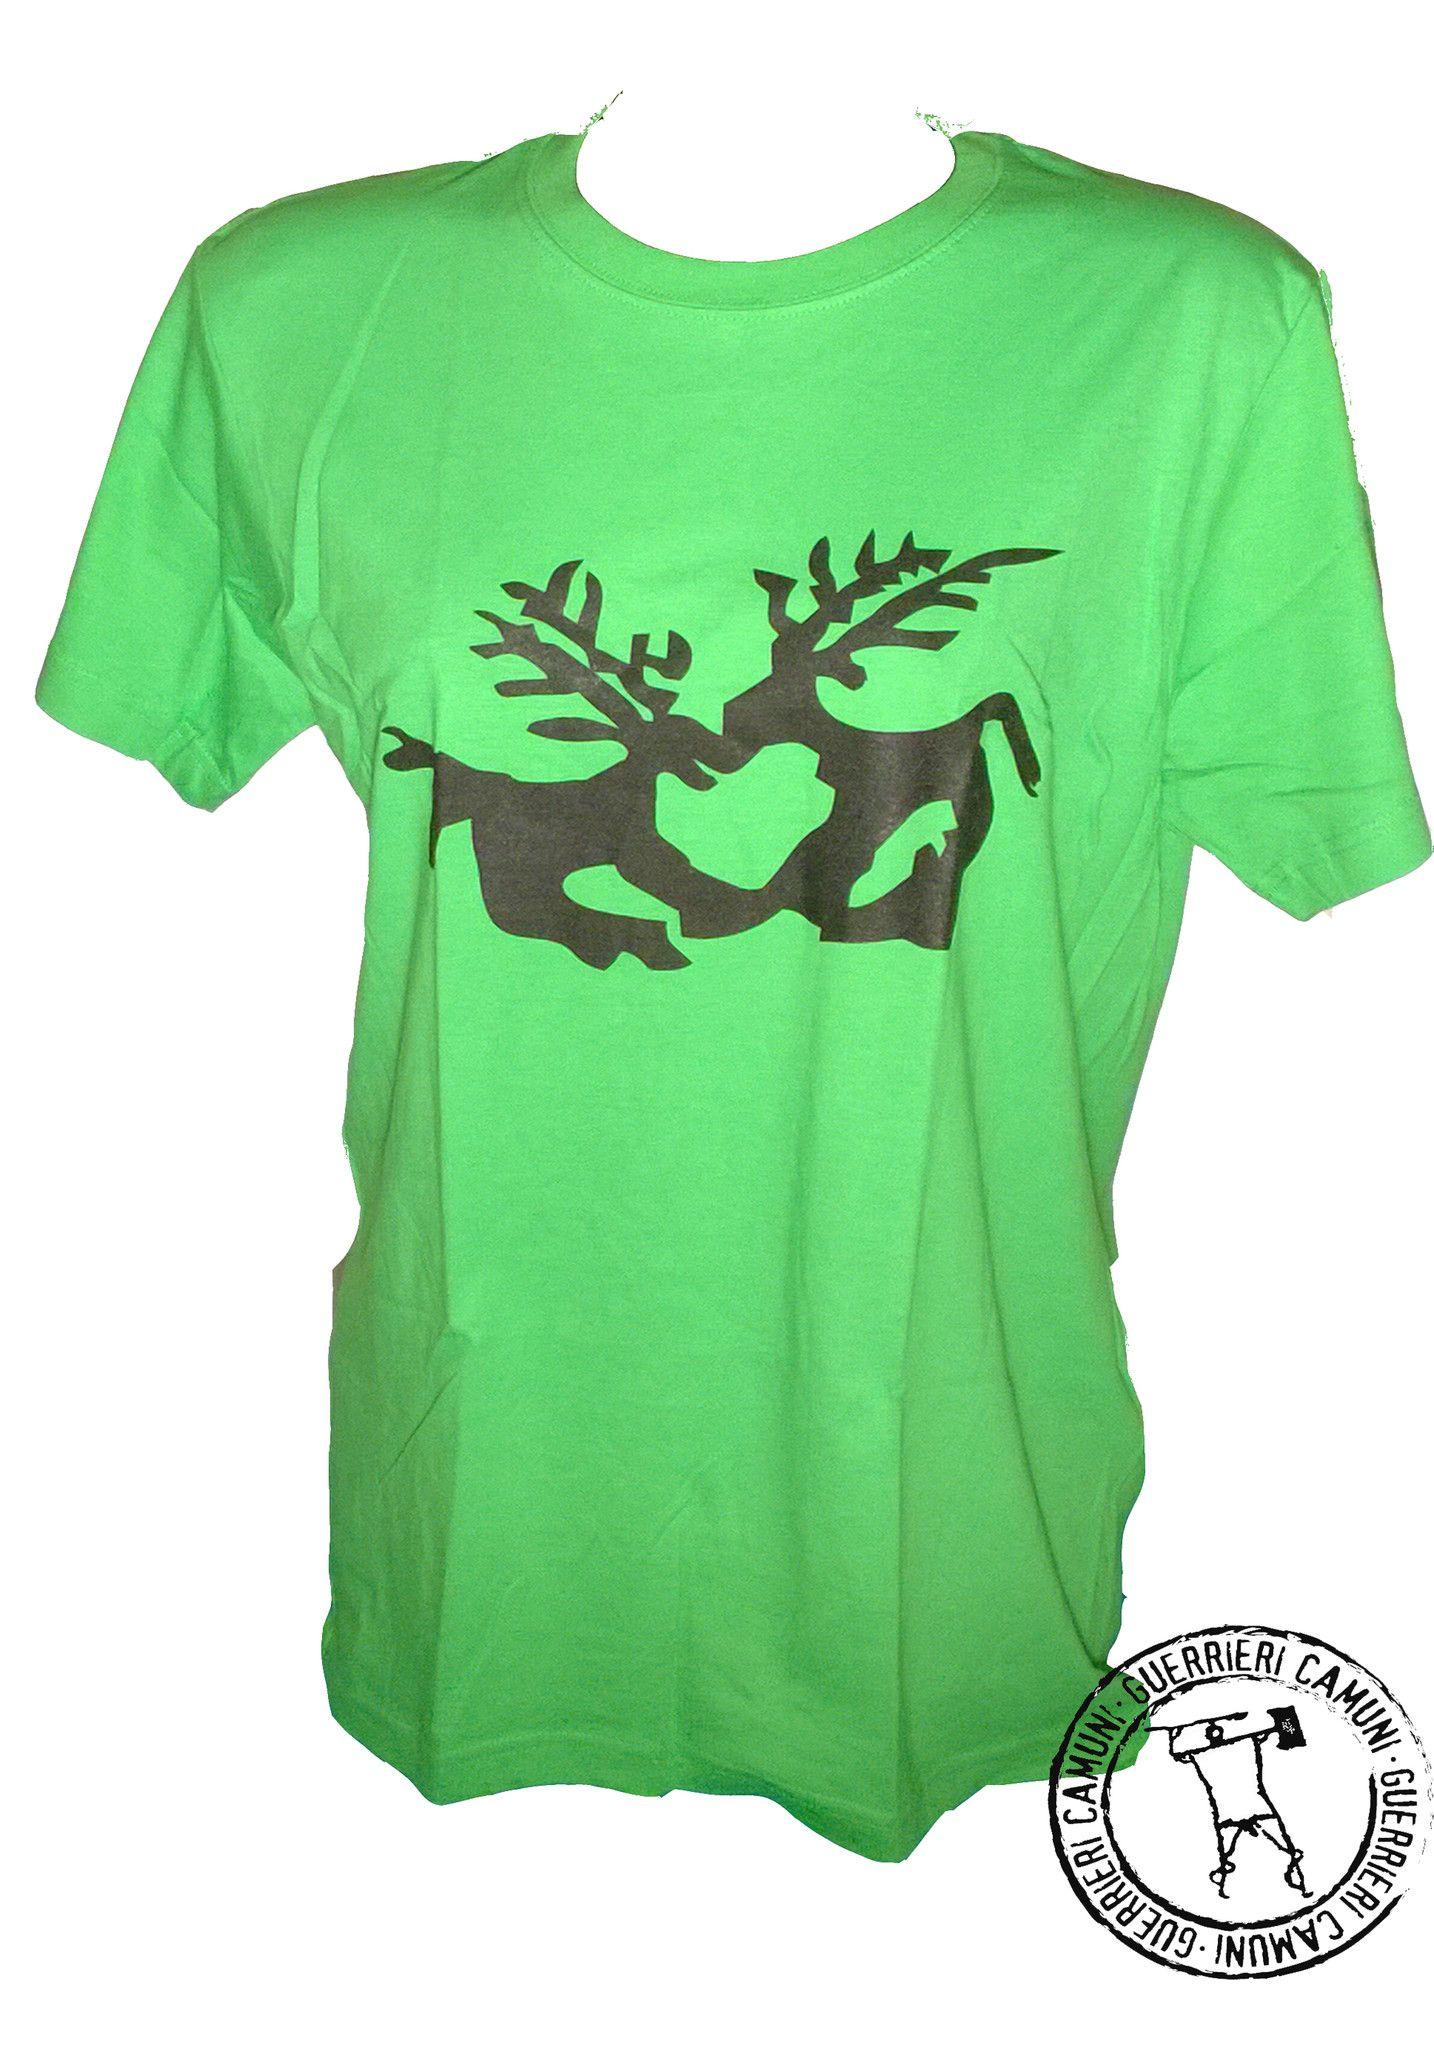 Maglietta T-Shirt Incisioni Rupestri Cervi in Amore Unisex Verde